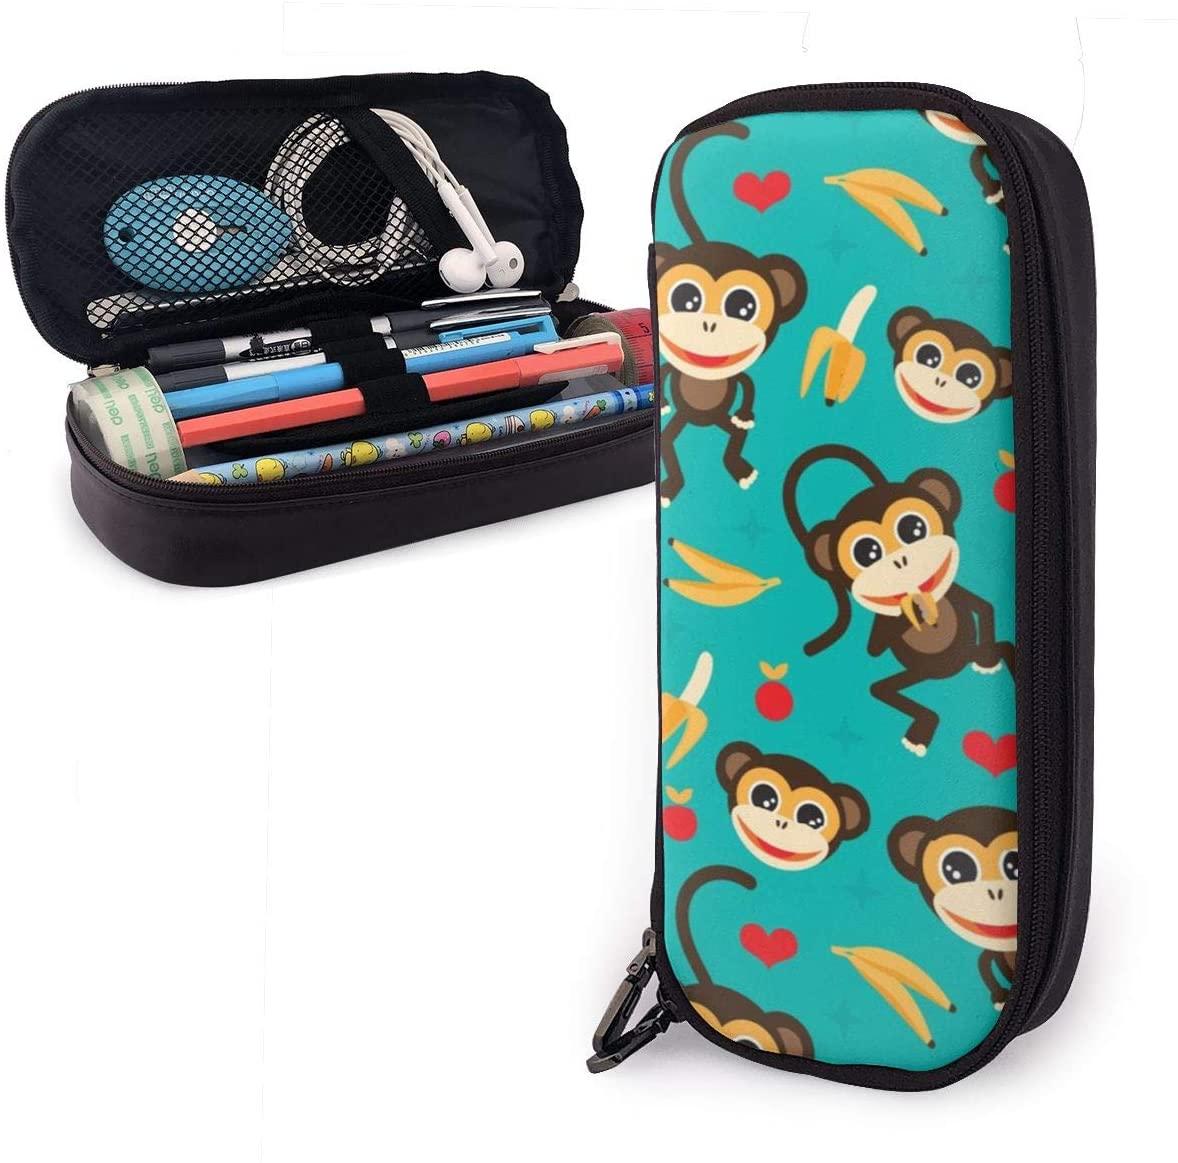 NiYoung Women Men Big Capacity Pencil Case Pen Holder Pouch Desk Organizer Bag with Zipper Durable Stationery Bag for School Supplies Office Stuff (Monkey Love Banana)